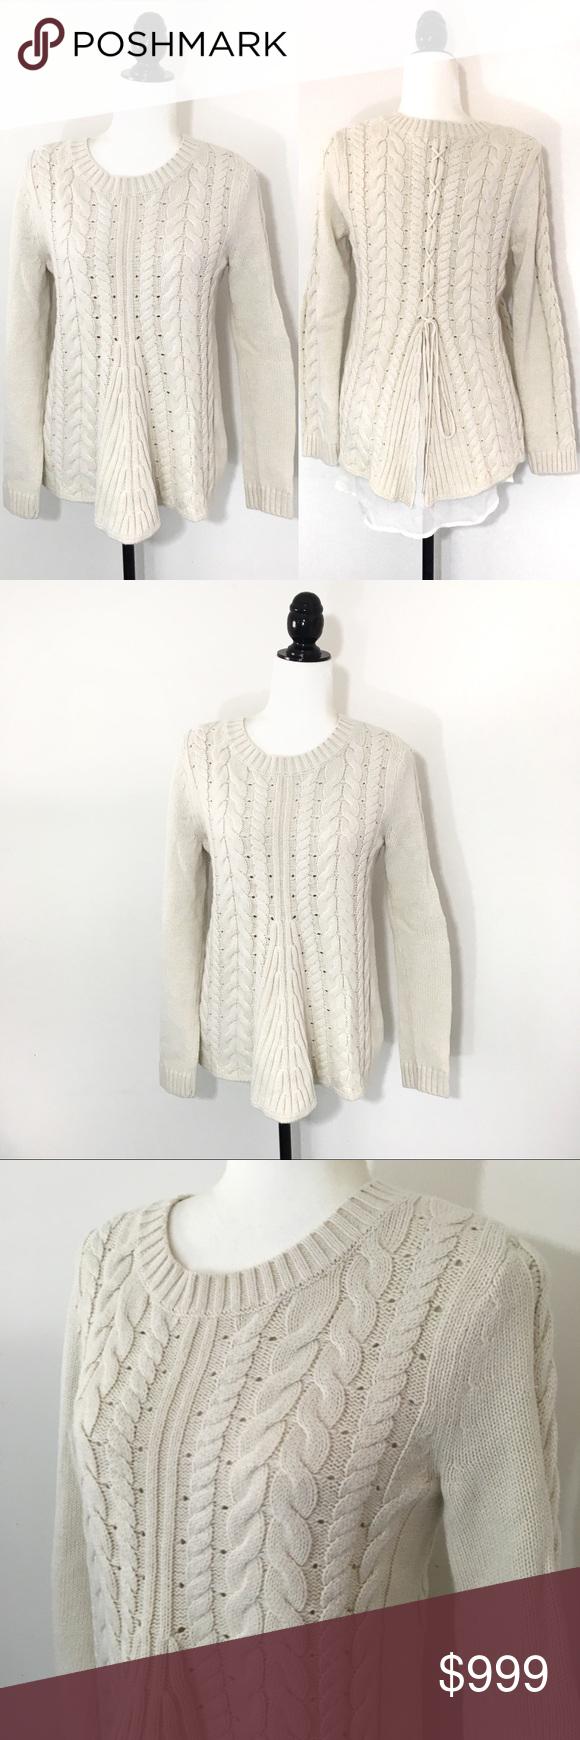 c6668c8290 Cabi Cream Lace Up Sweater 3157 M Cabi Cream cable knit lace up sweater  Crewneck Chiffon panel detail  3157 Size medium white CAbi Sweaters Crew    Scoop ...